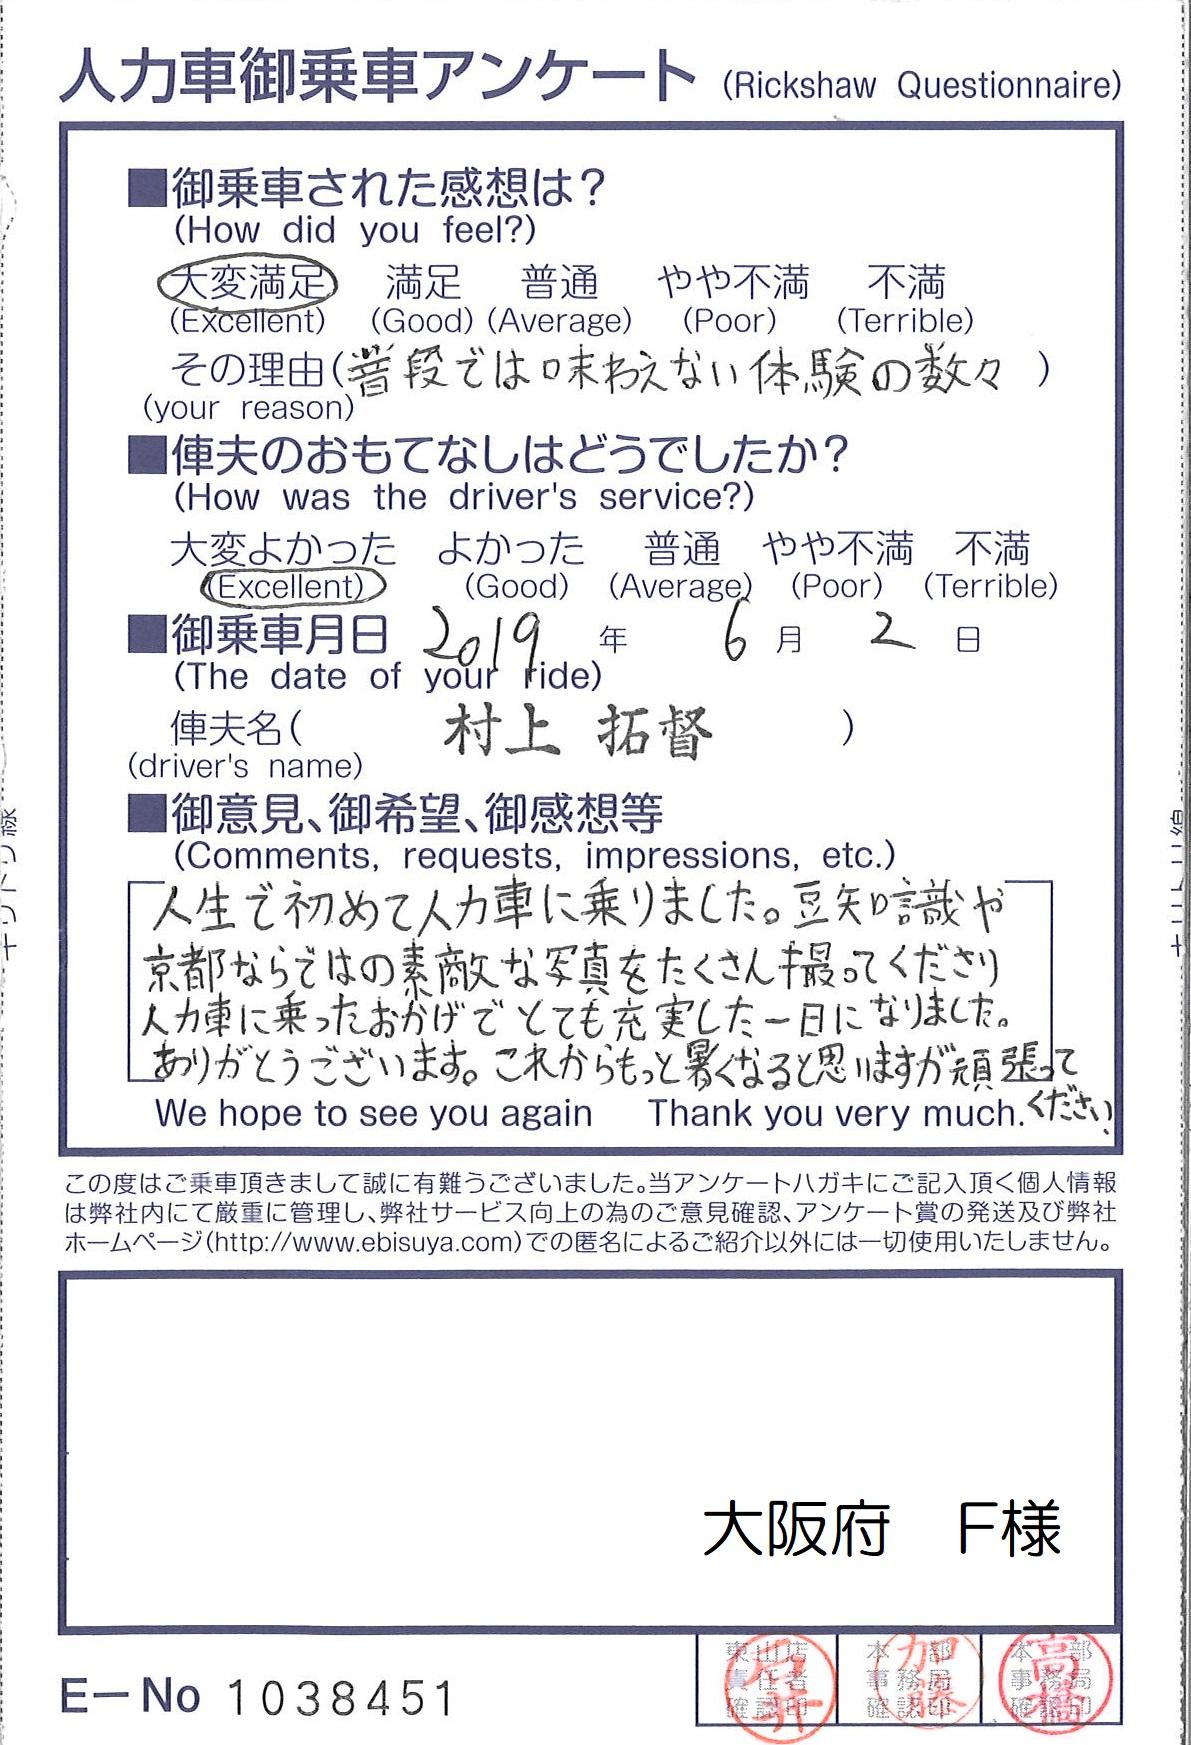 大阪府 F様